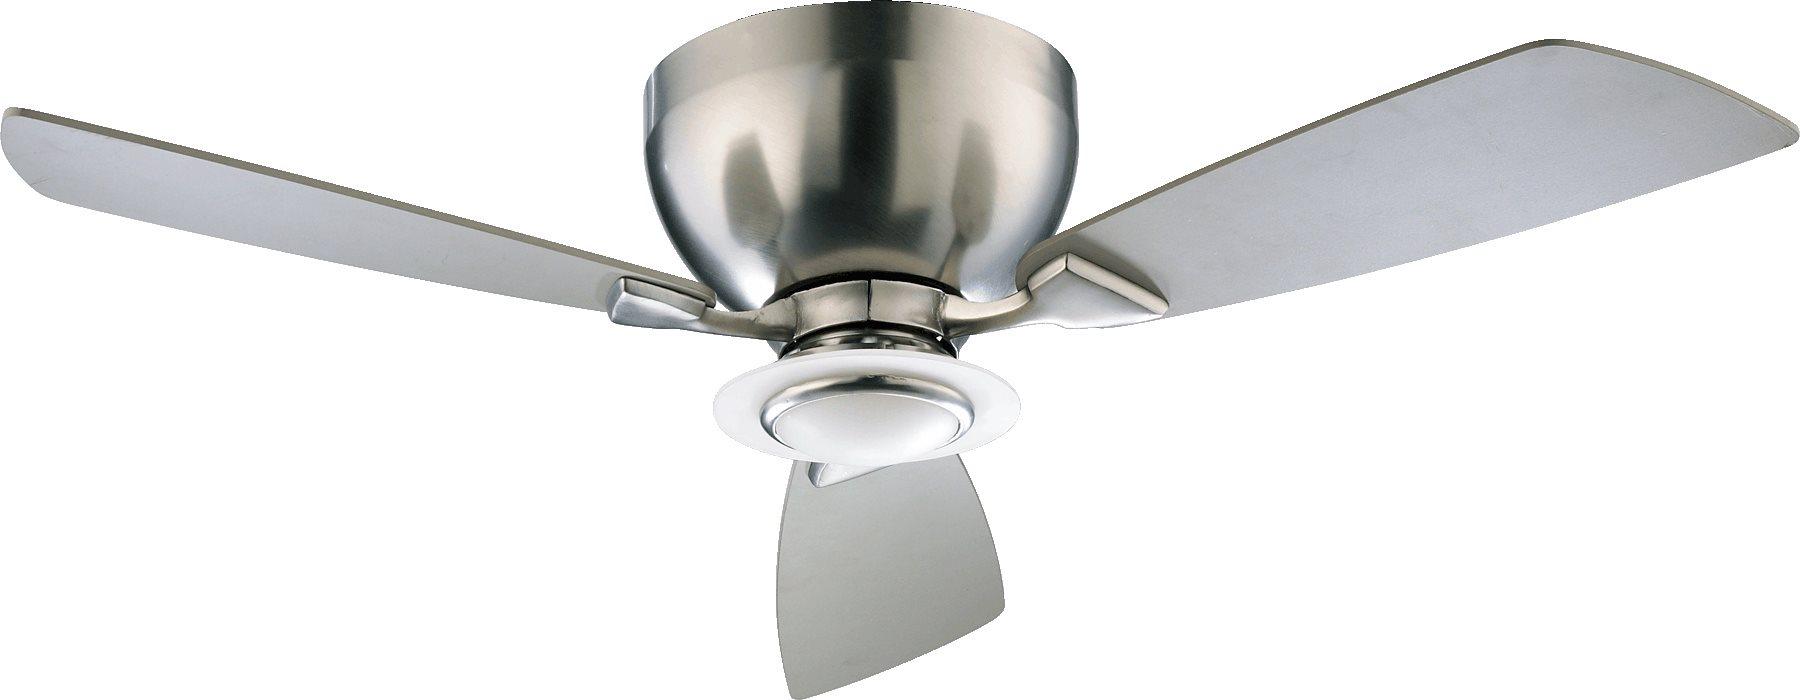 Quorum Lighting Nikko 44 Contemporary Hugger Ceiling Fan  eBay